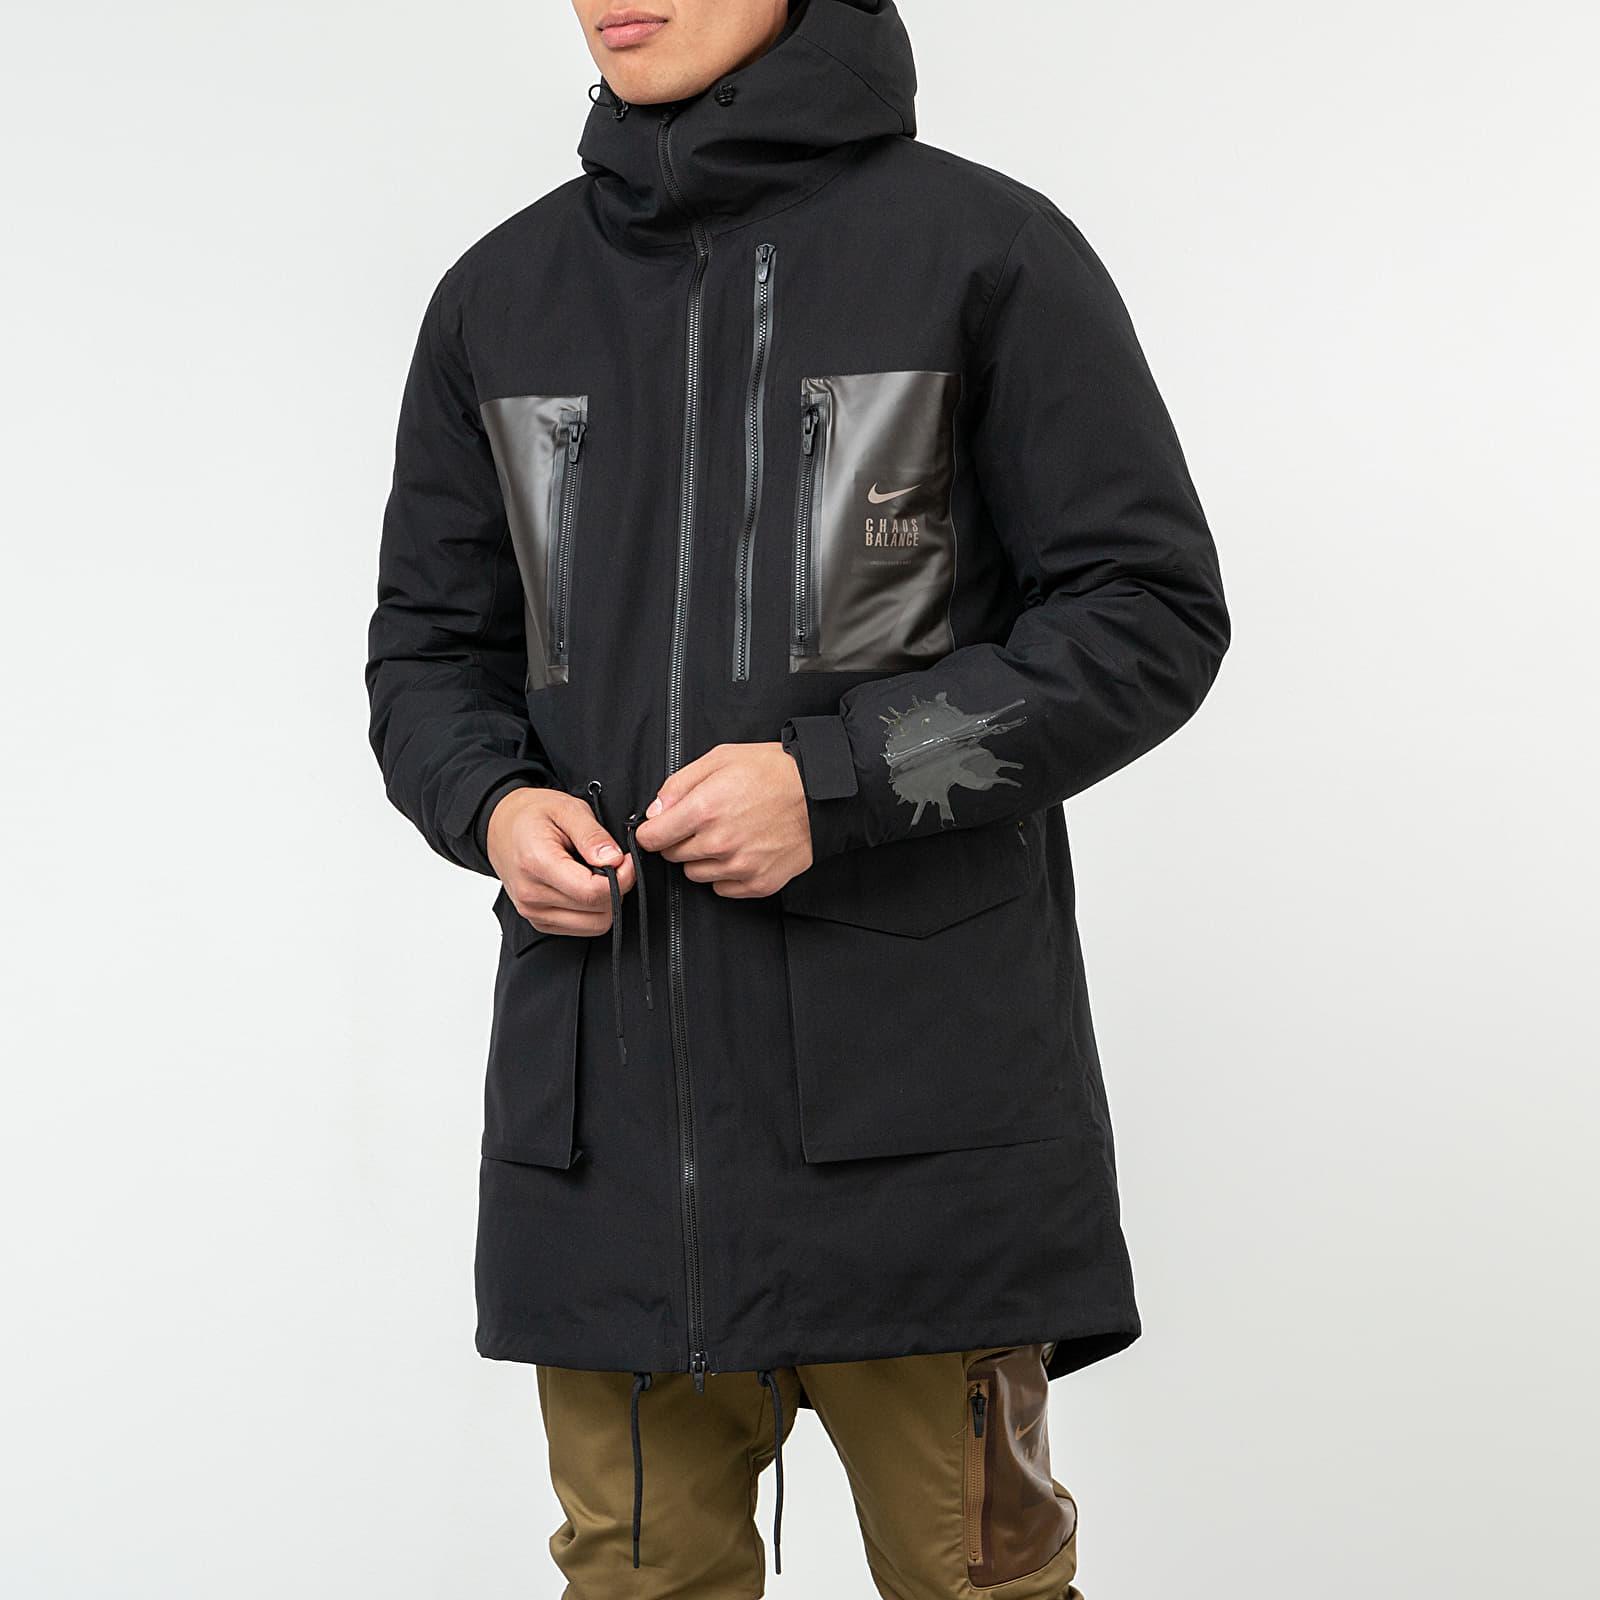 Jackets NikeLab x Undercover Chaos Balance Jacket Black